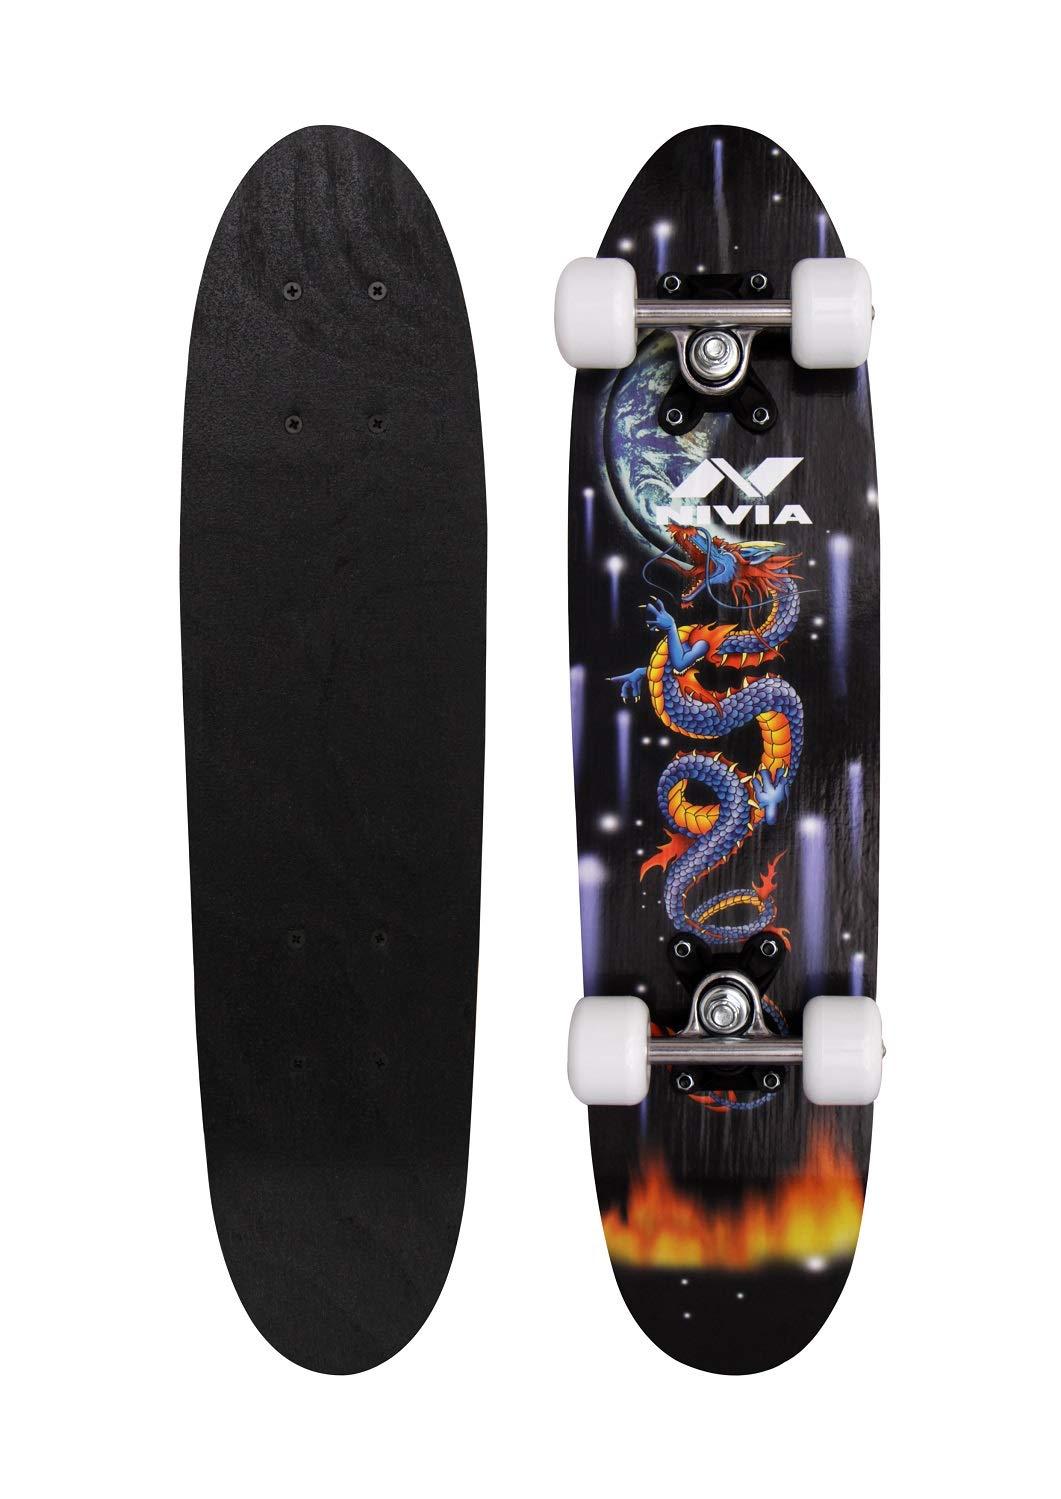 Nivia 31 x 8 inches Skateboard